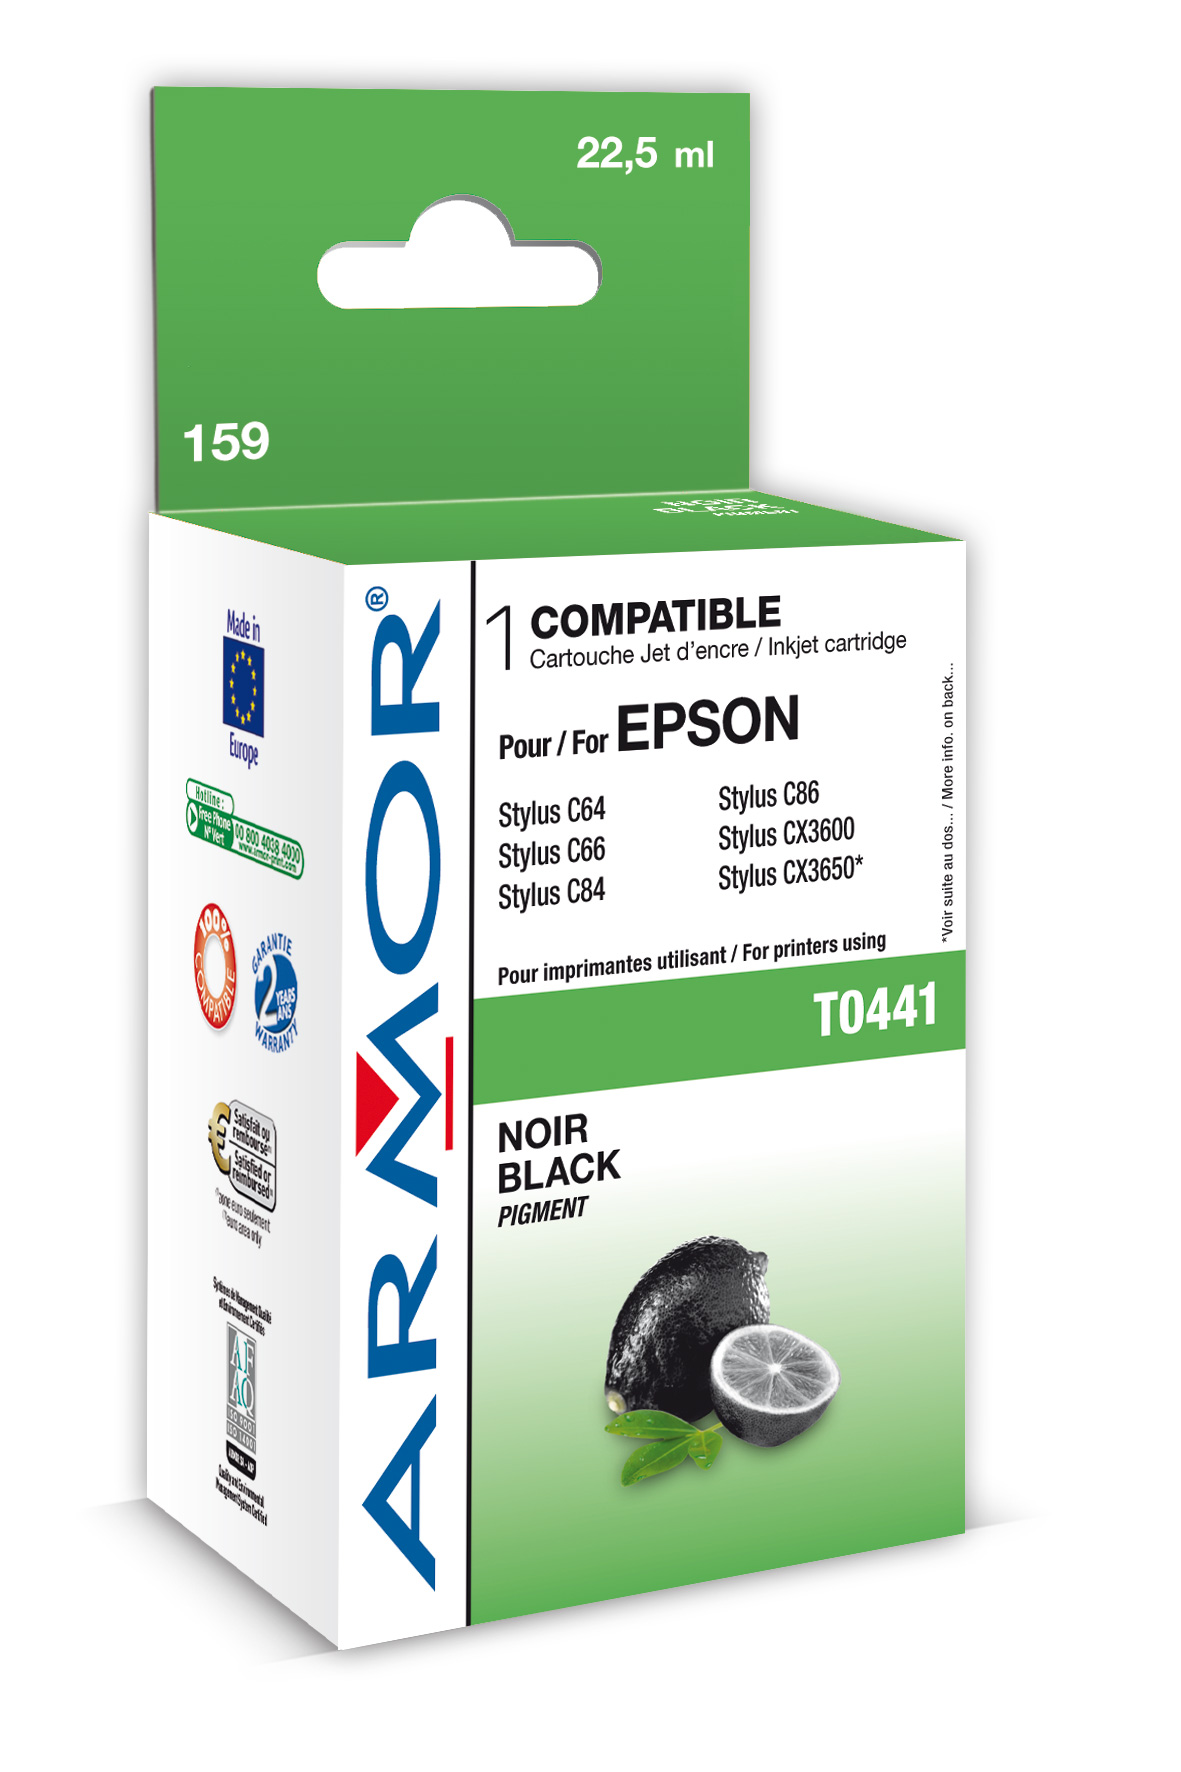 Armor ink-jet pro Epson C64/84 (T044140), 22ml, Bk